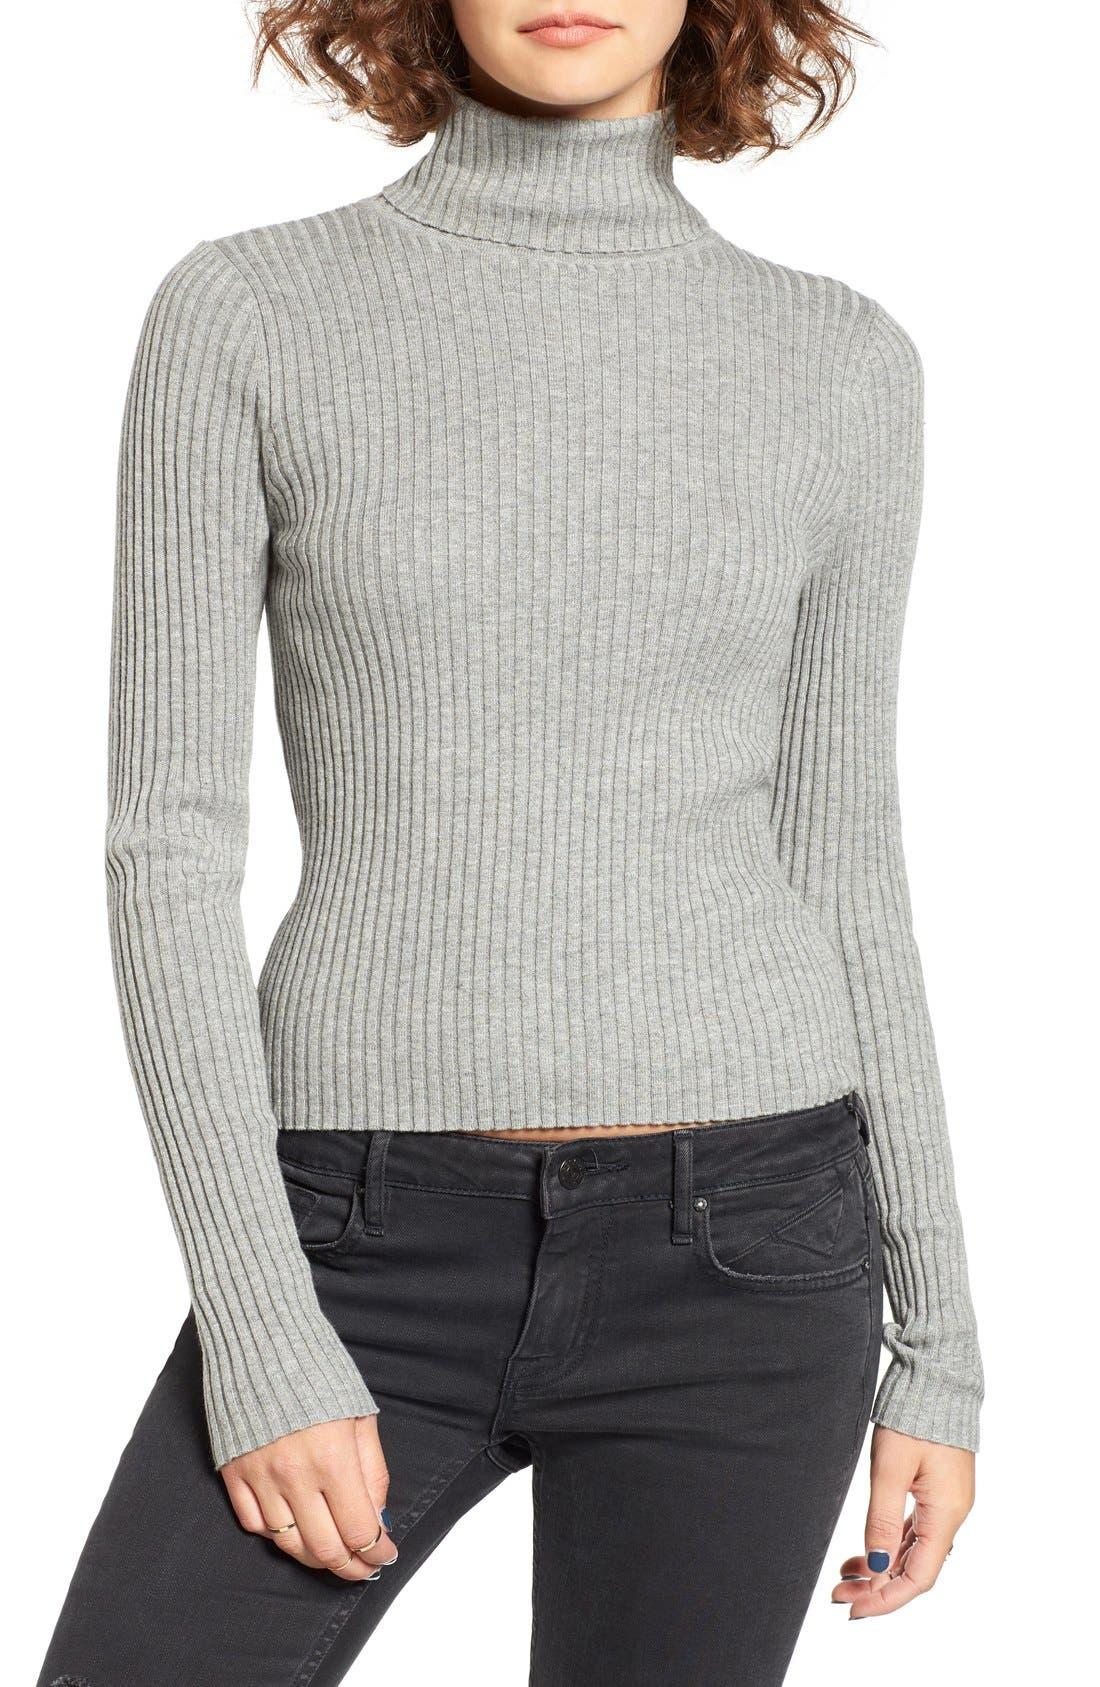 Main Image - BP. Rib Knit Turtleneck Sweater